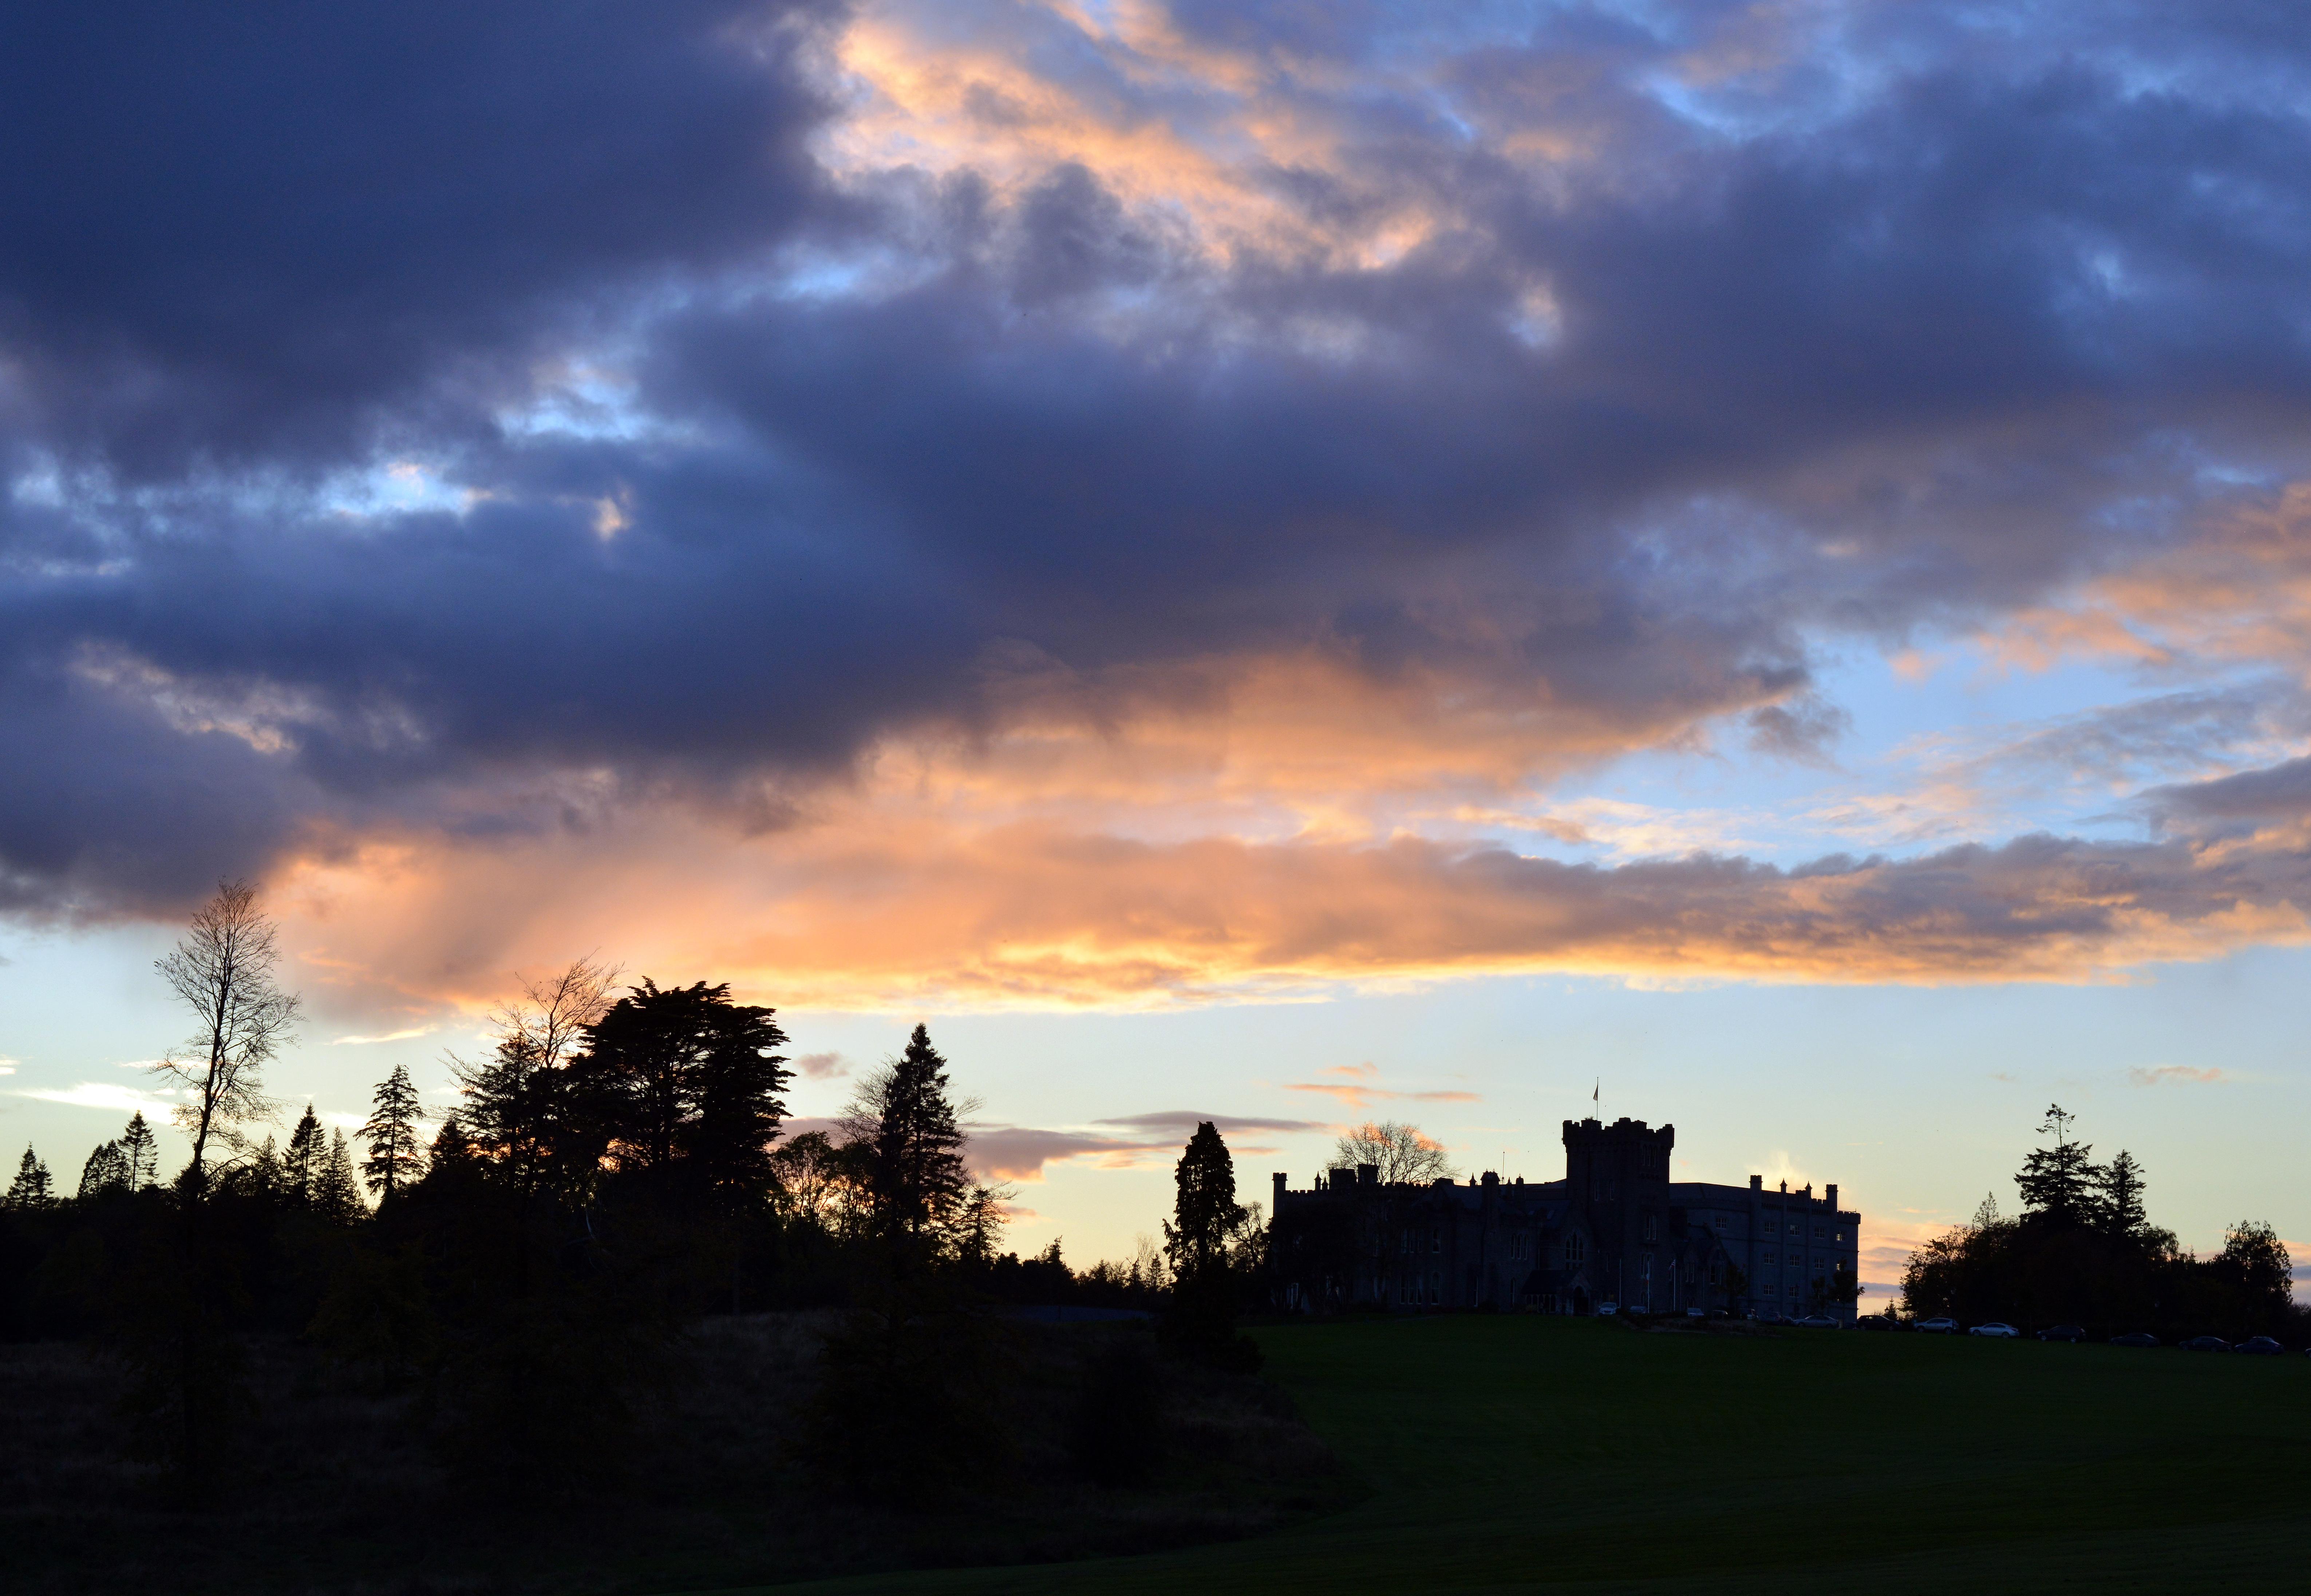 Review: Kilronan Castle, Co. Roscommon